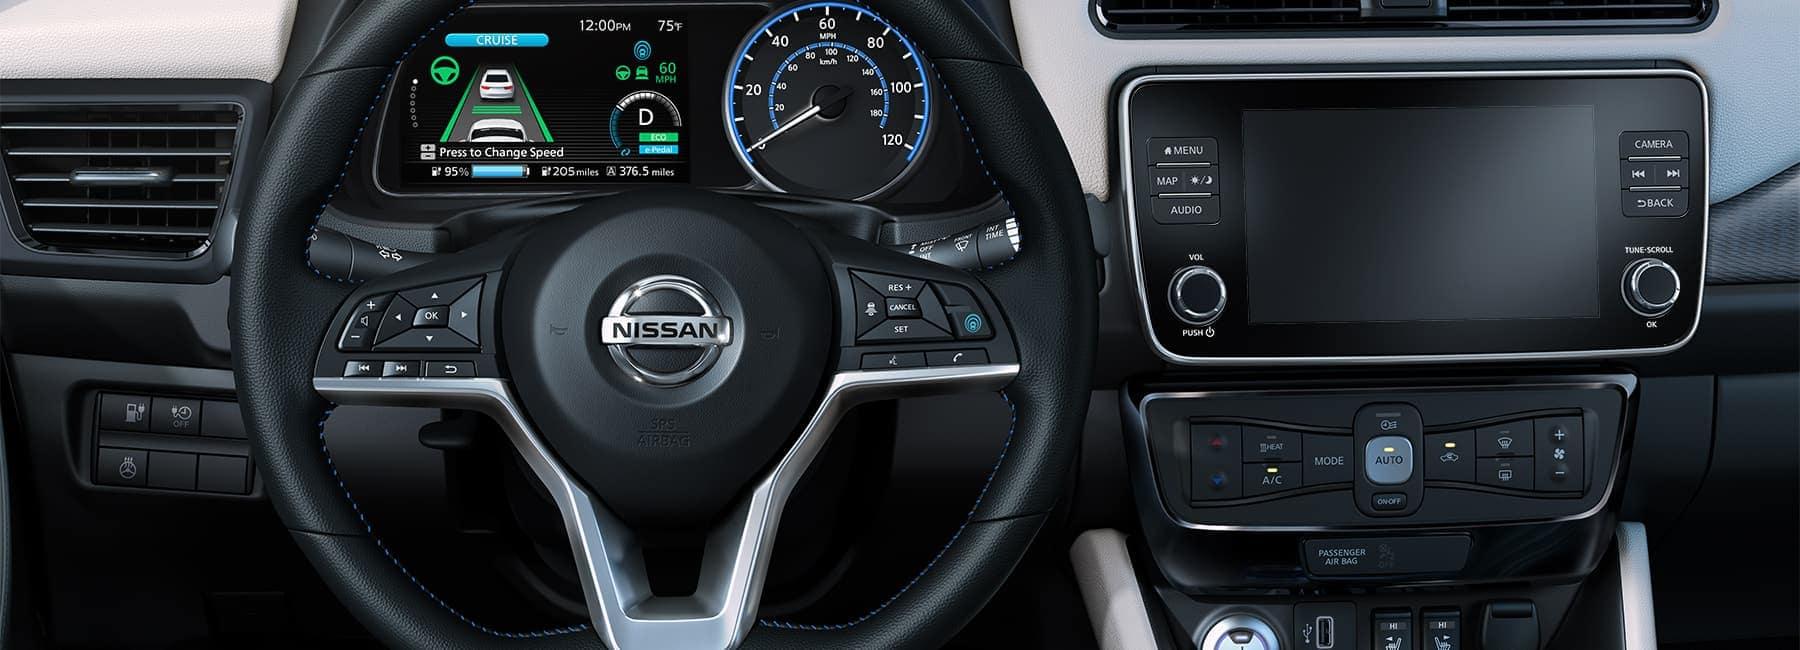 2020 nissan leaf interior steering wheel